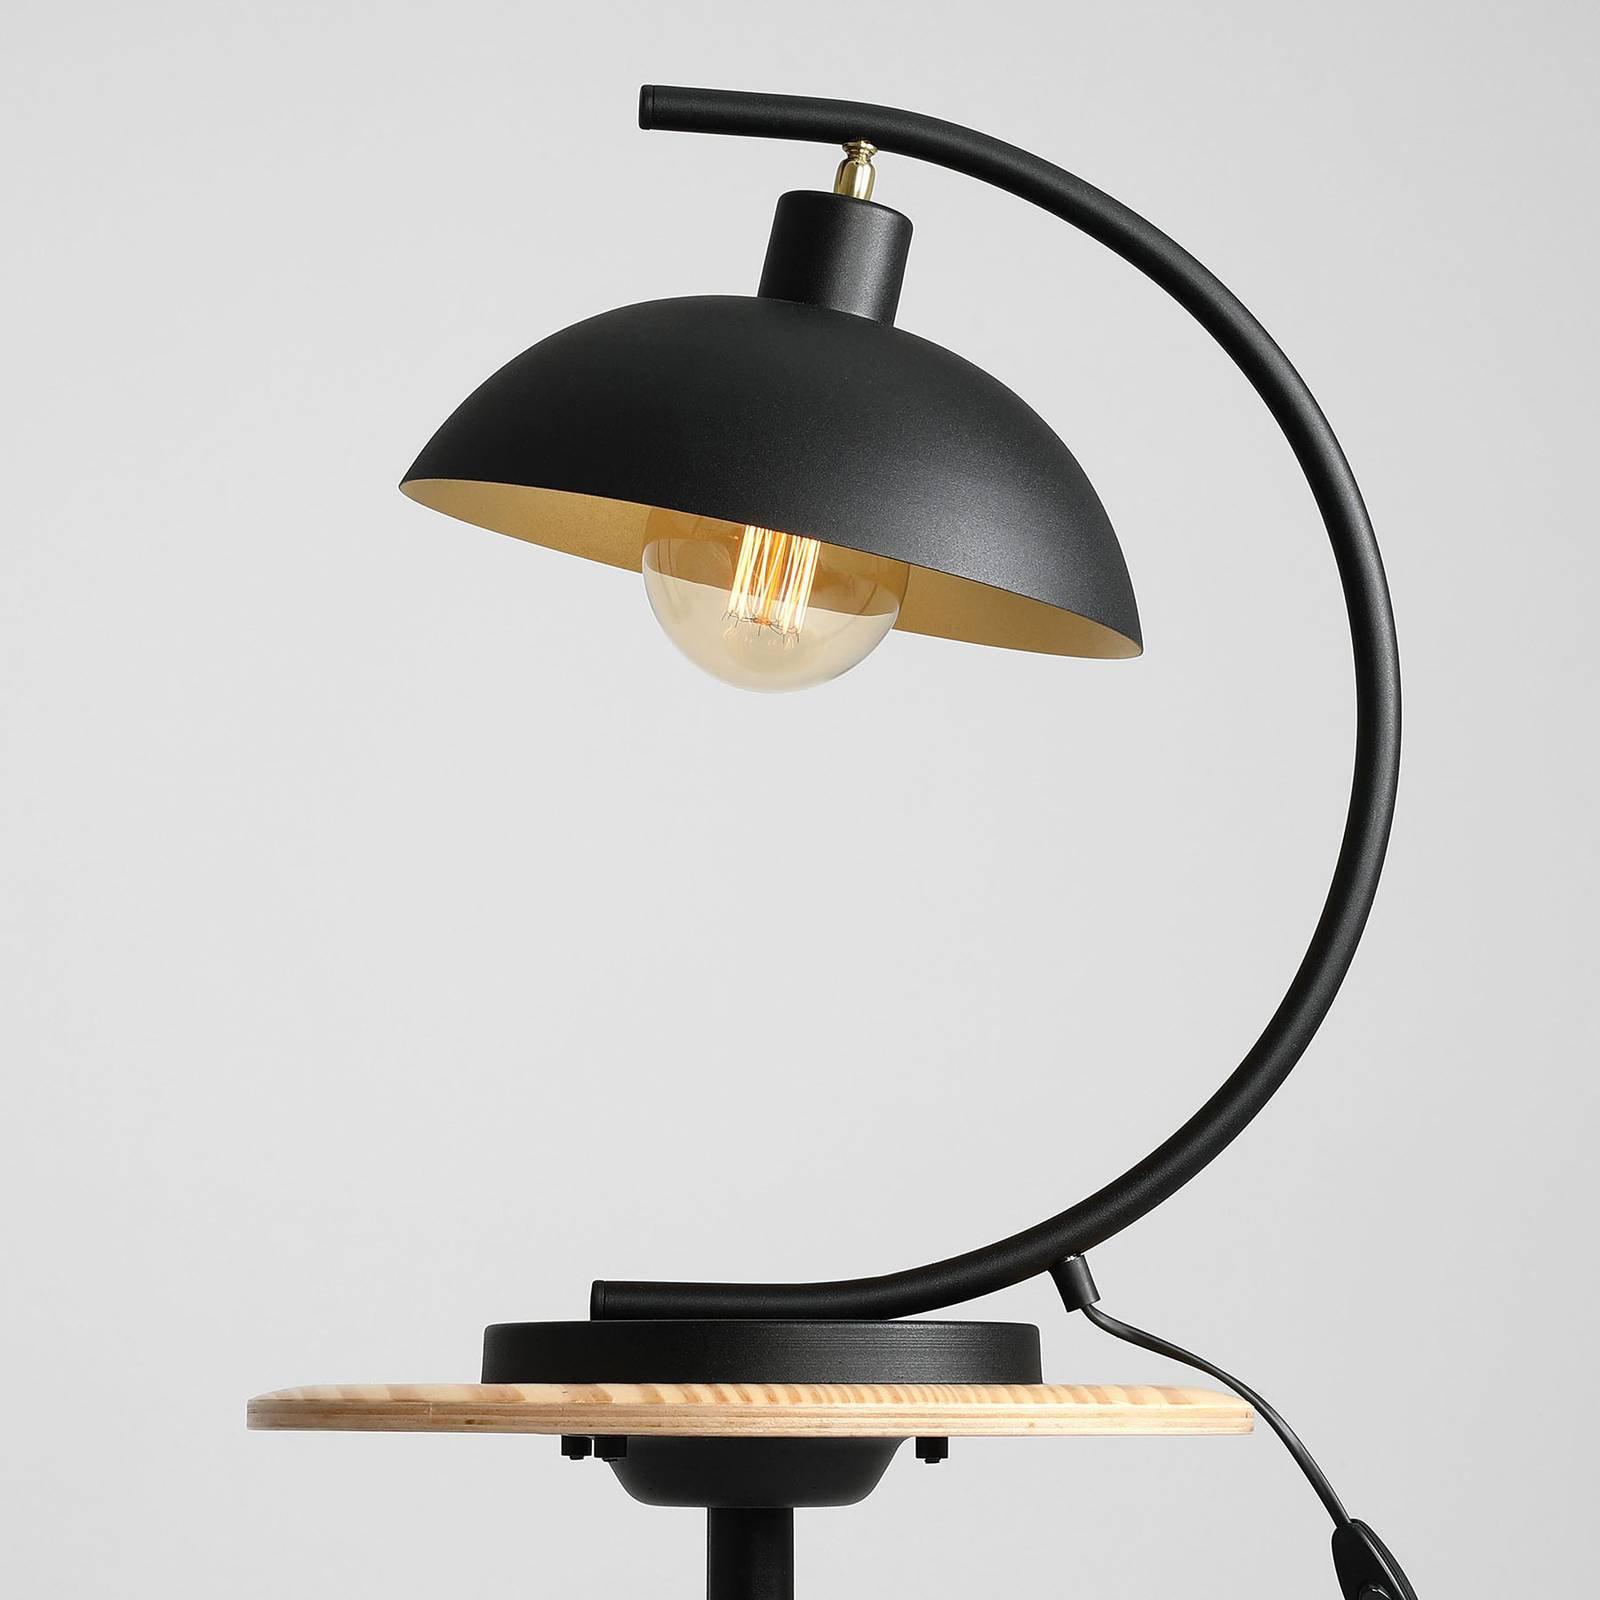 1036 bordlampe, 1 lyskilde, svart-gull